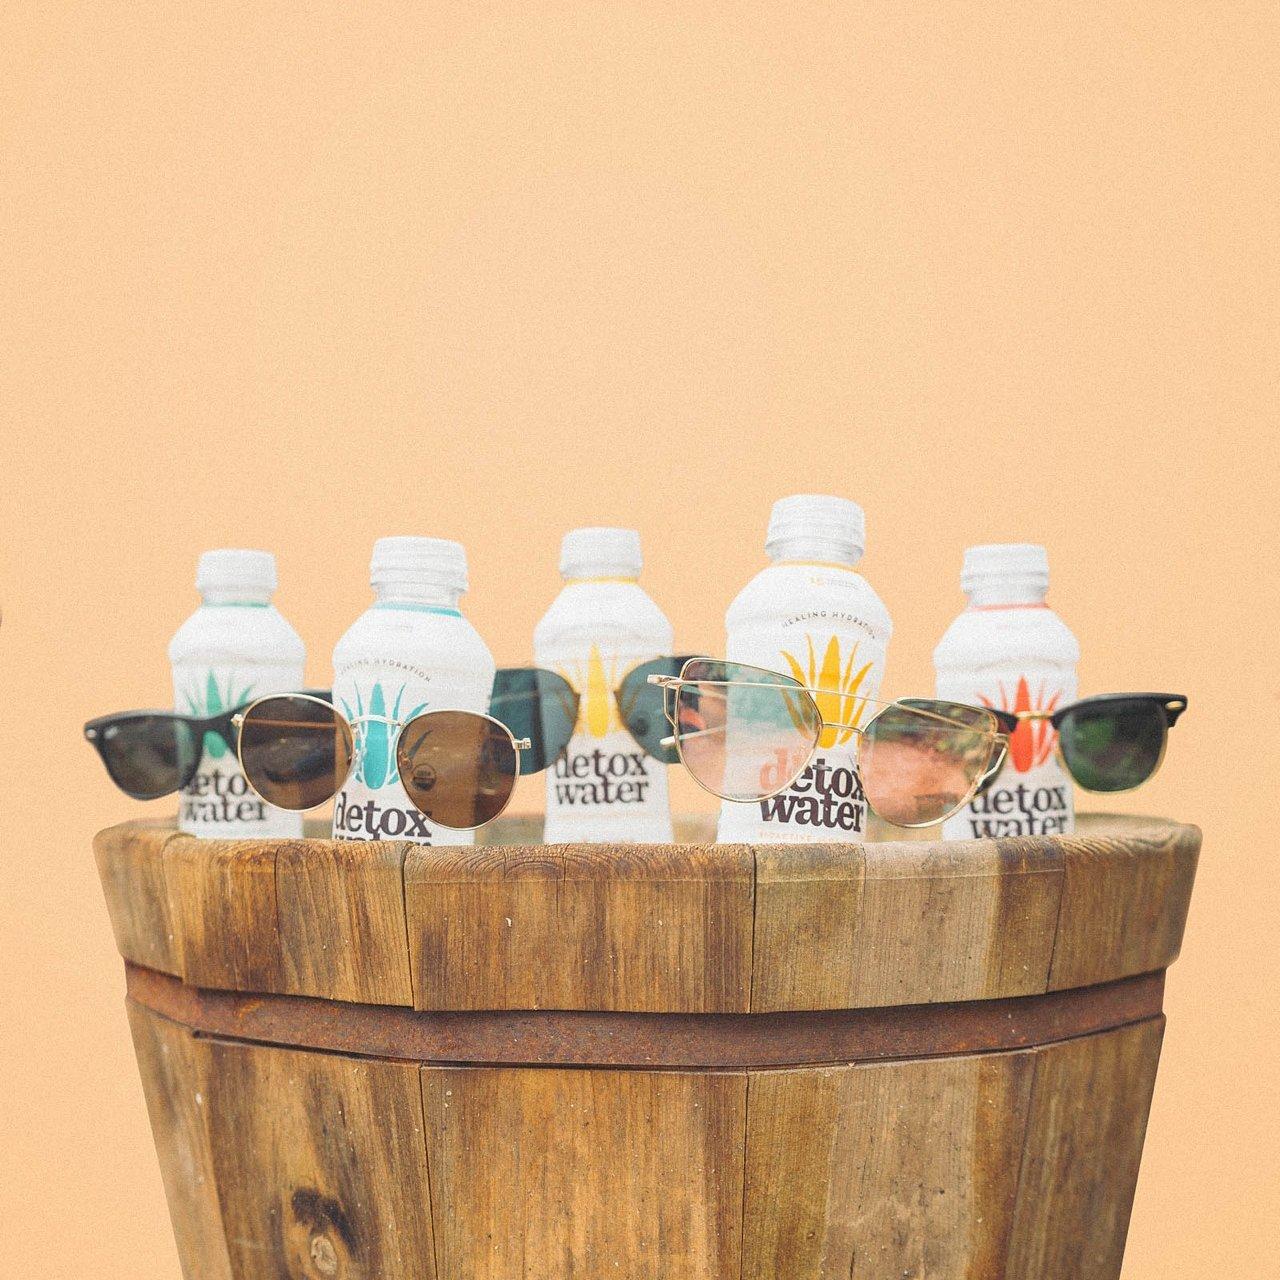 Detoxwater Prebiotic Aloe Water (Sampler Pack) - 16 Fluid Ounces, Pack of 6